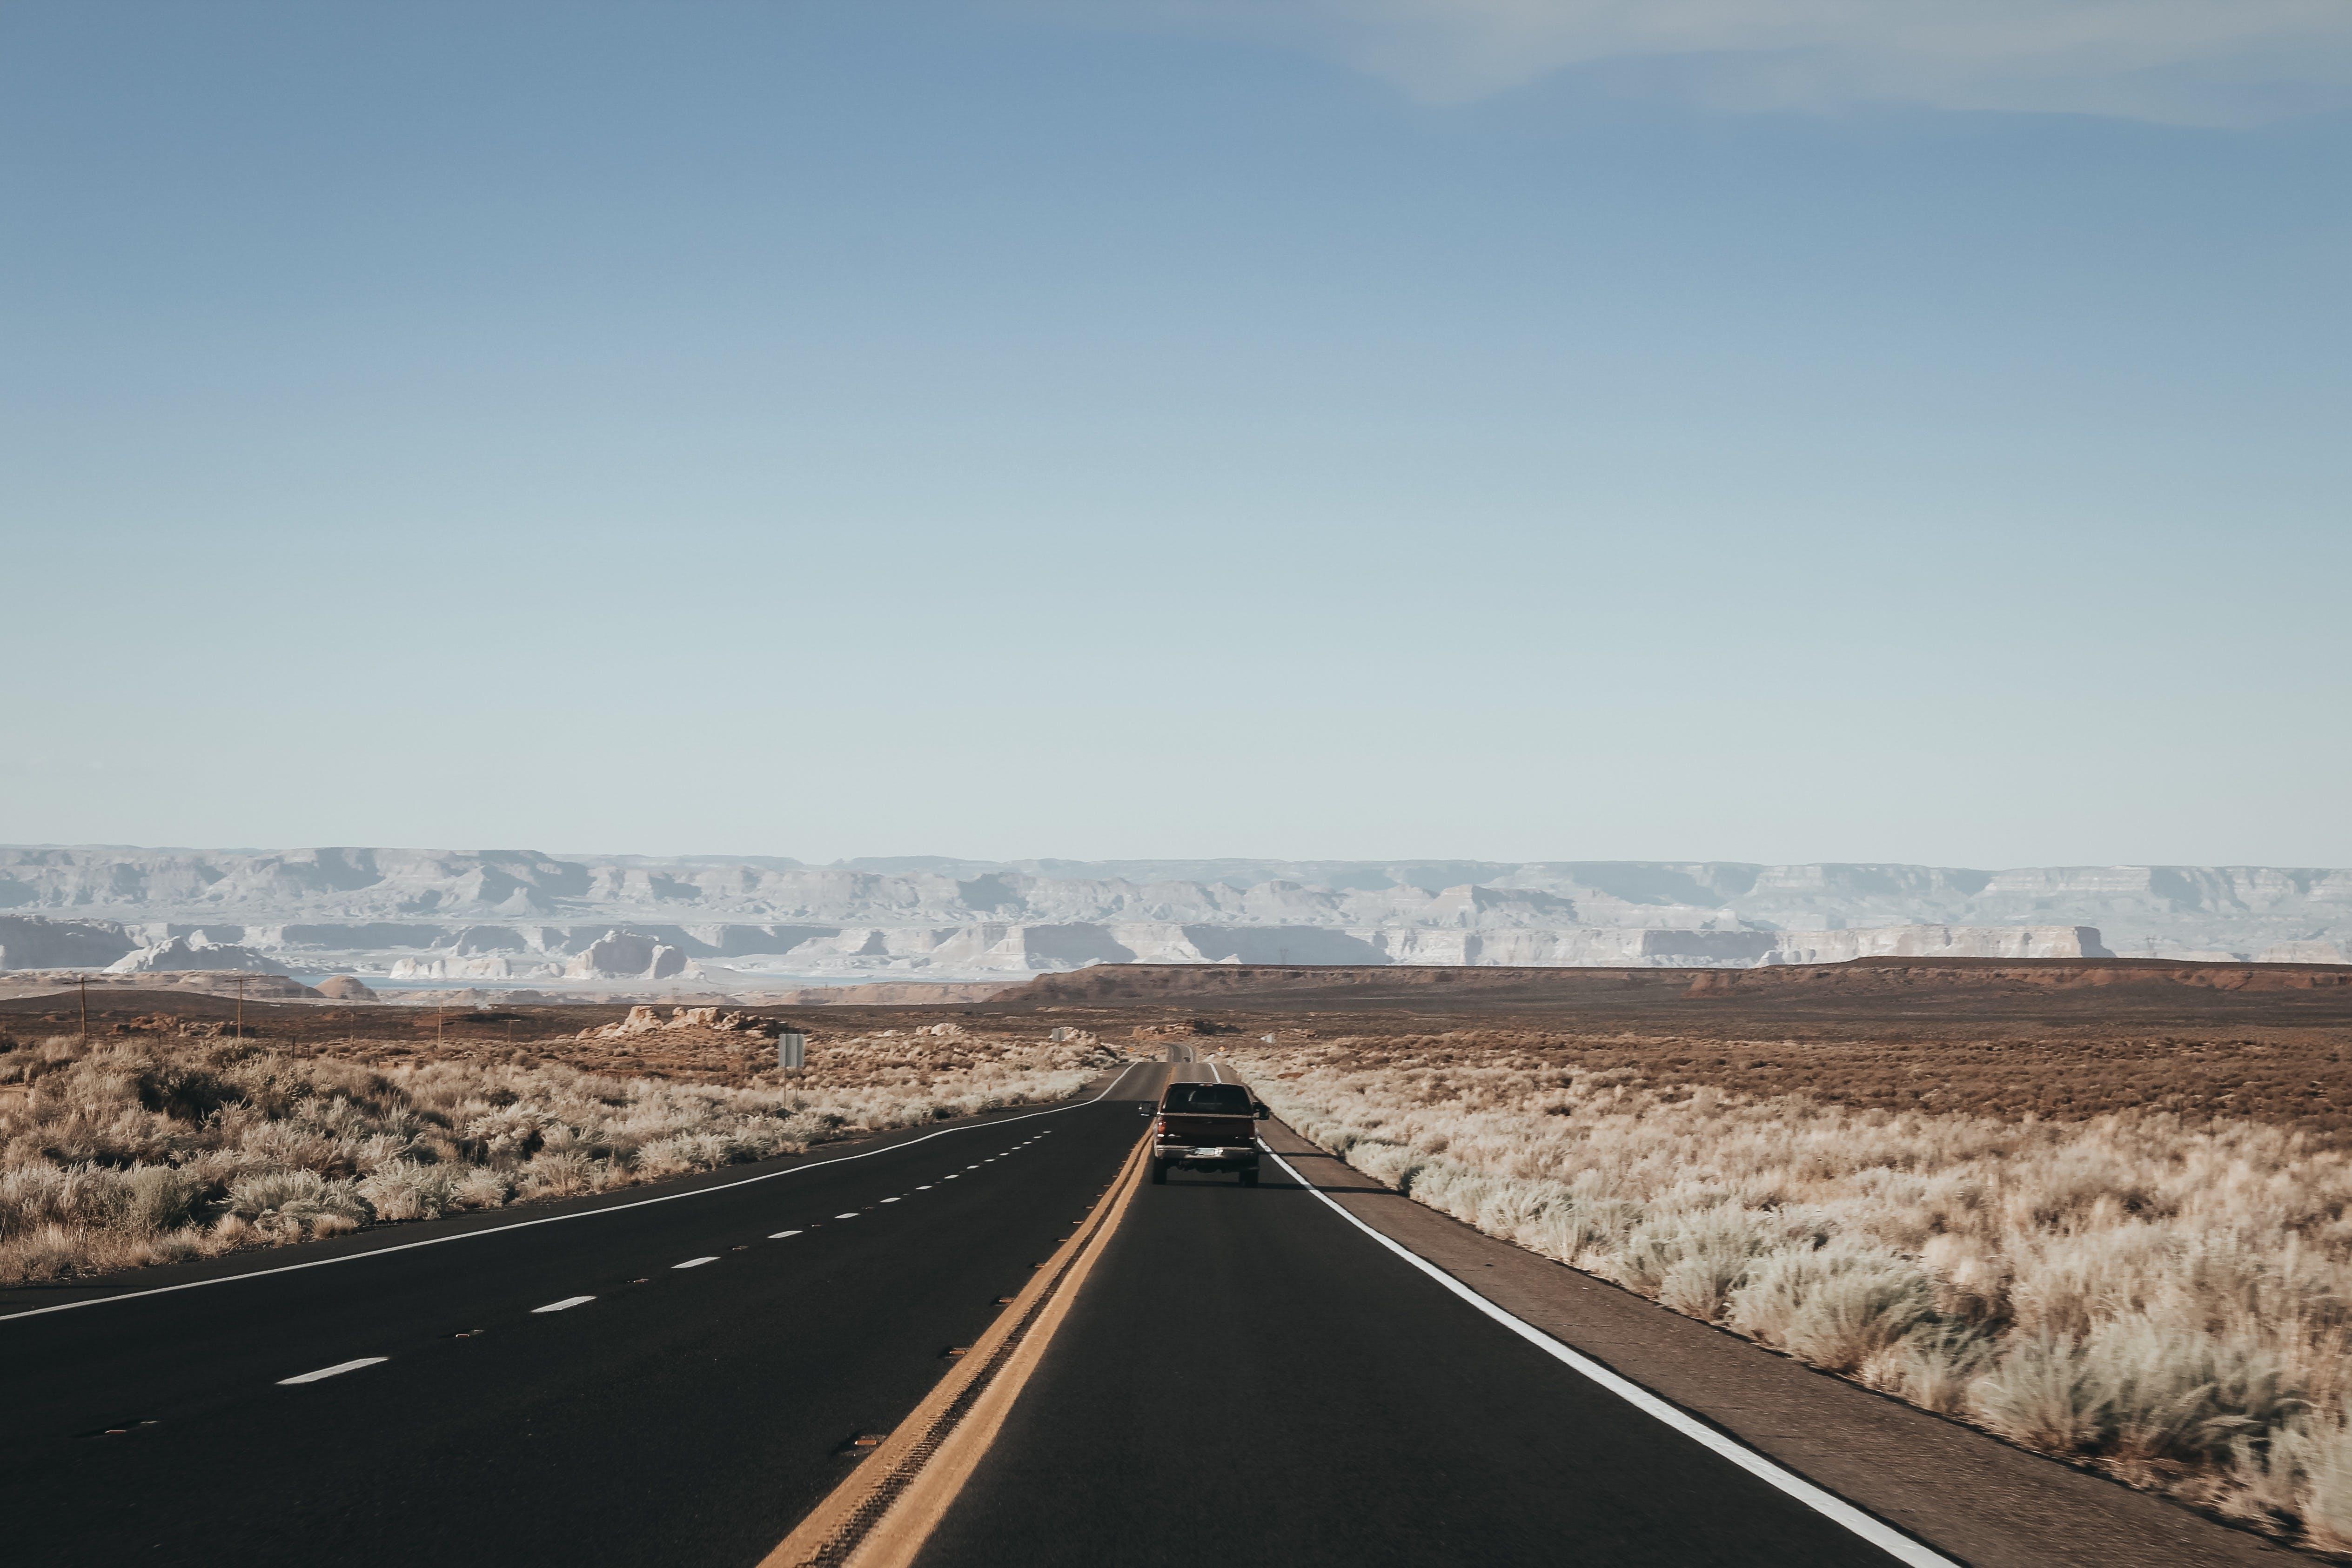 Kostenloses Stock Foto zu asphalt, auto, automobil, berge